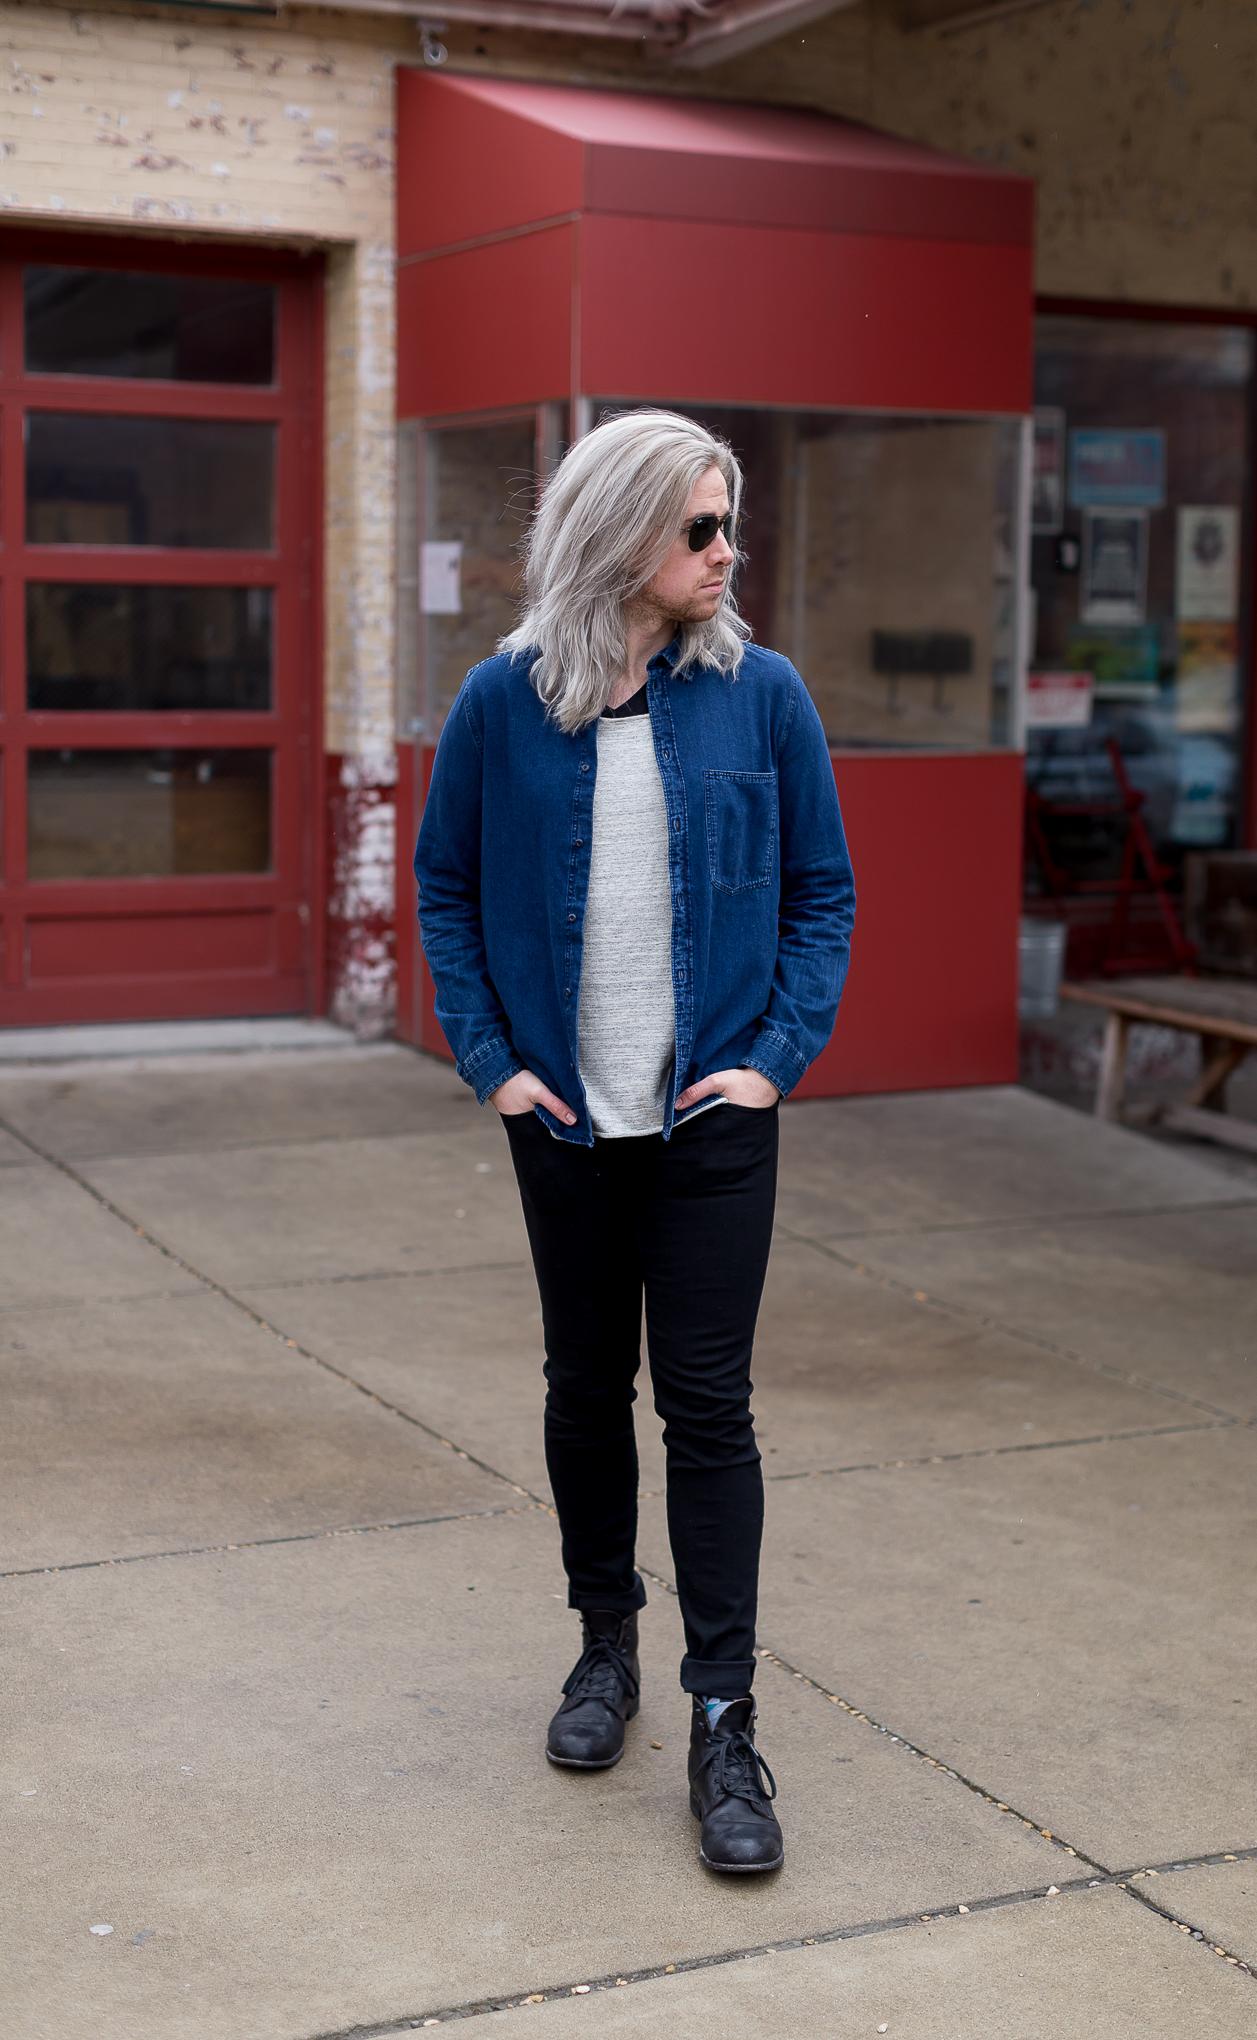 mens fashion blogger, mens lifestyle blogger, hm denim shirt, rag and bone skinny jeans, mens blog